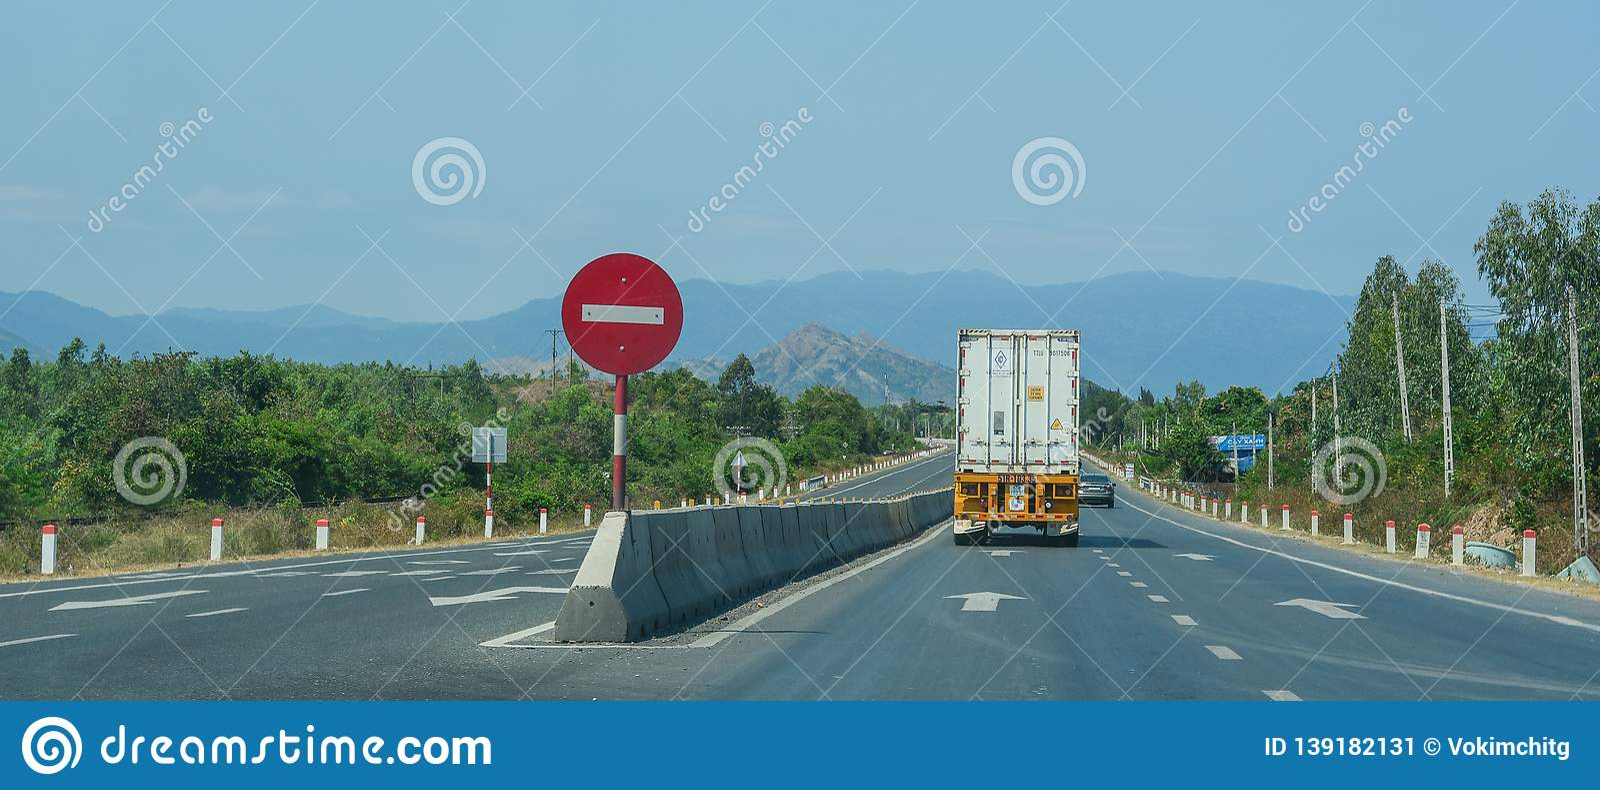 Highway in Nha Trang, Vietnam